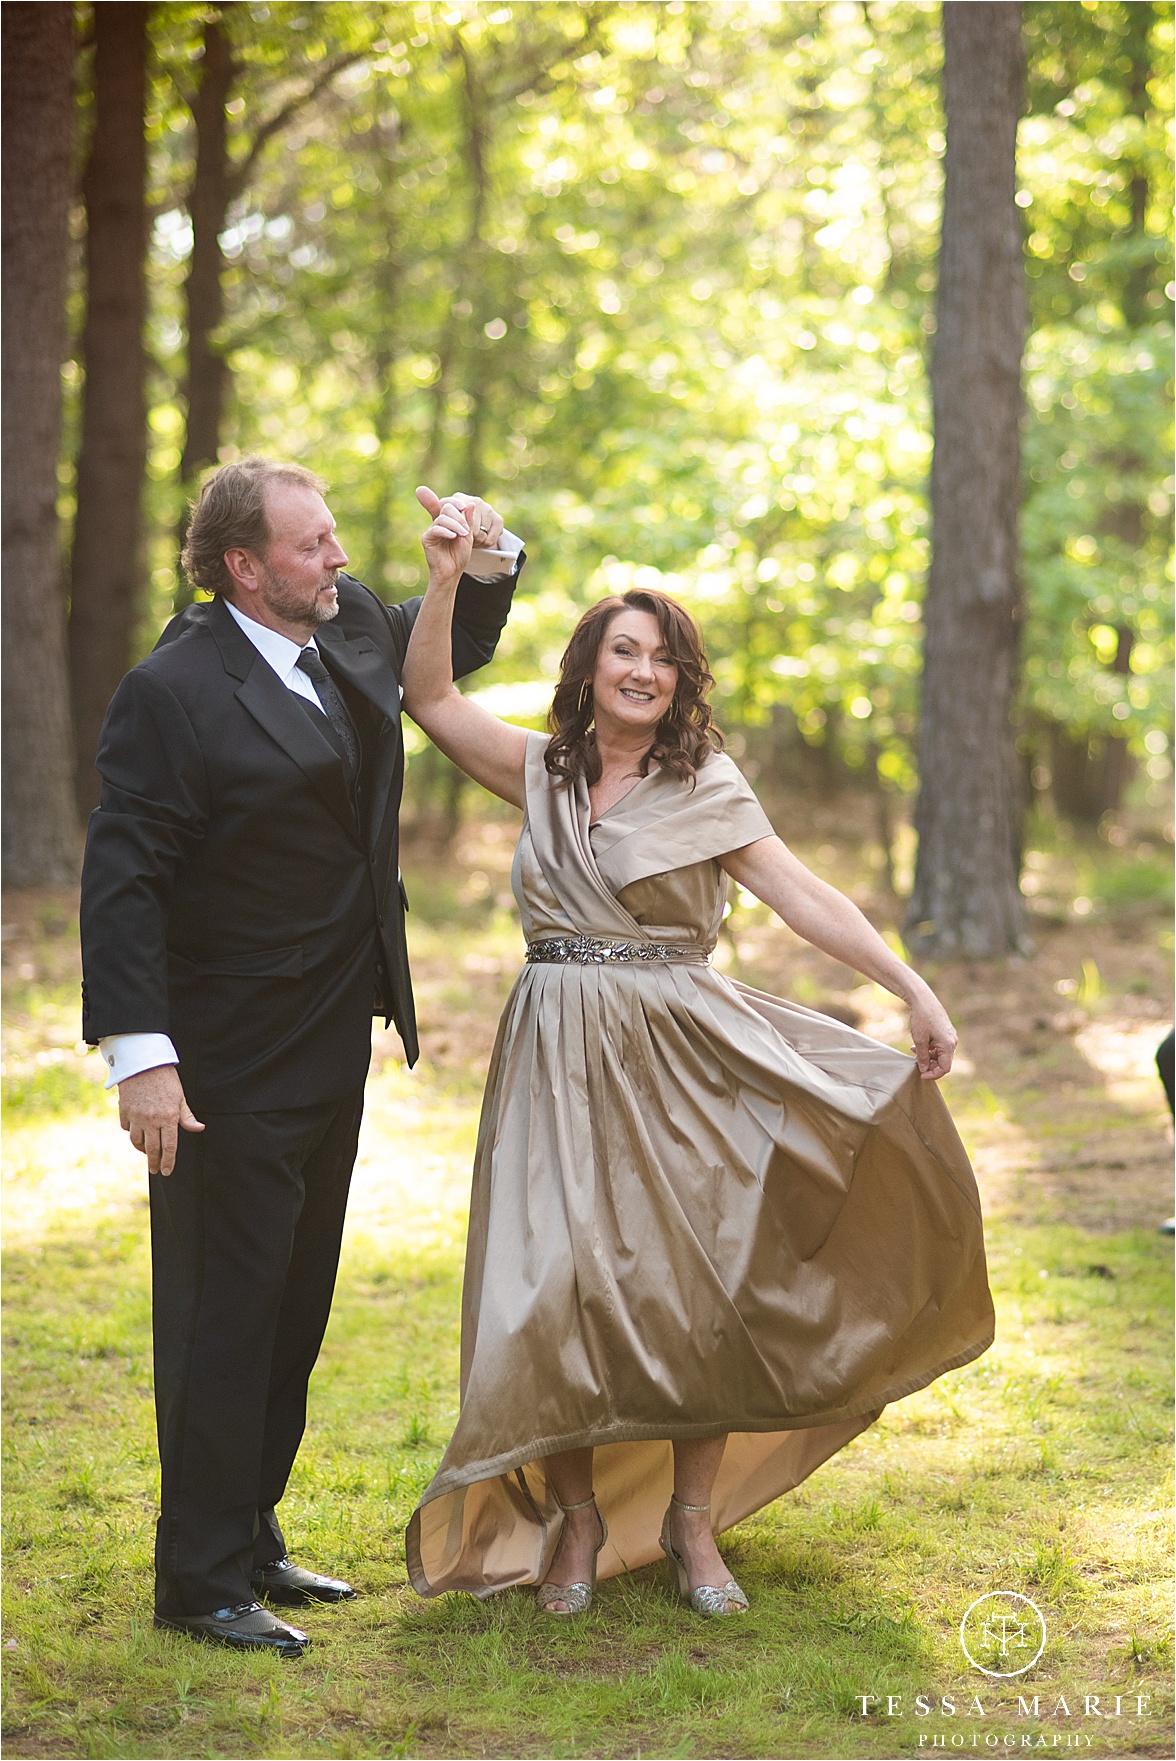 Tessa_marie_weddings_columbus_wedding_photographer_wedding_day_spring_outdoor_wedding_0104.jpg